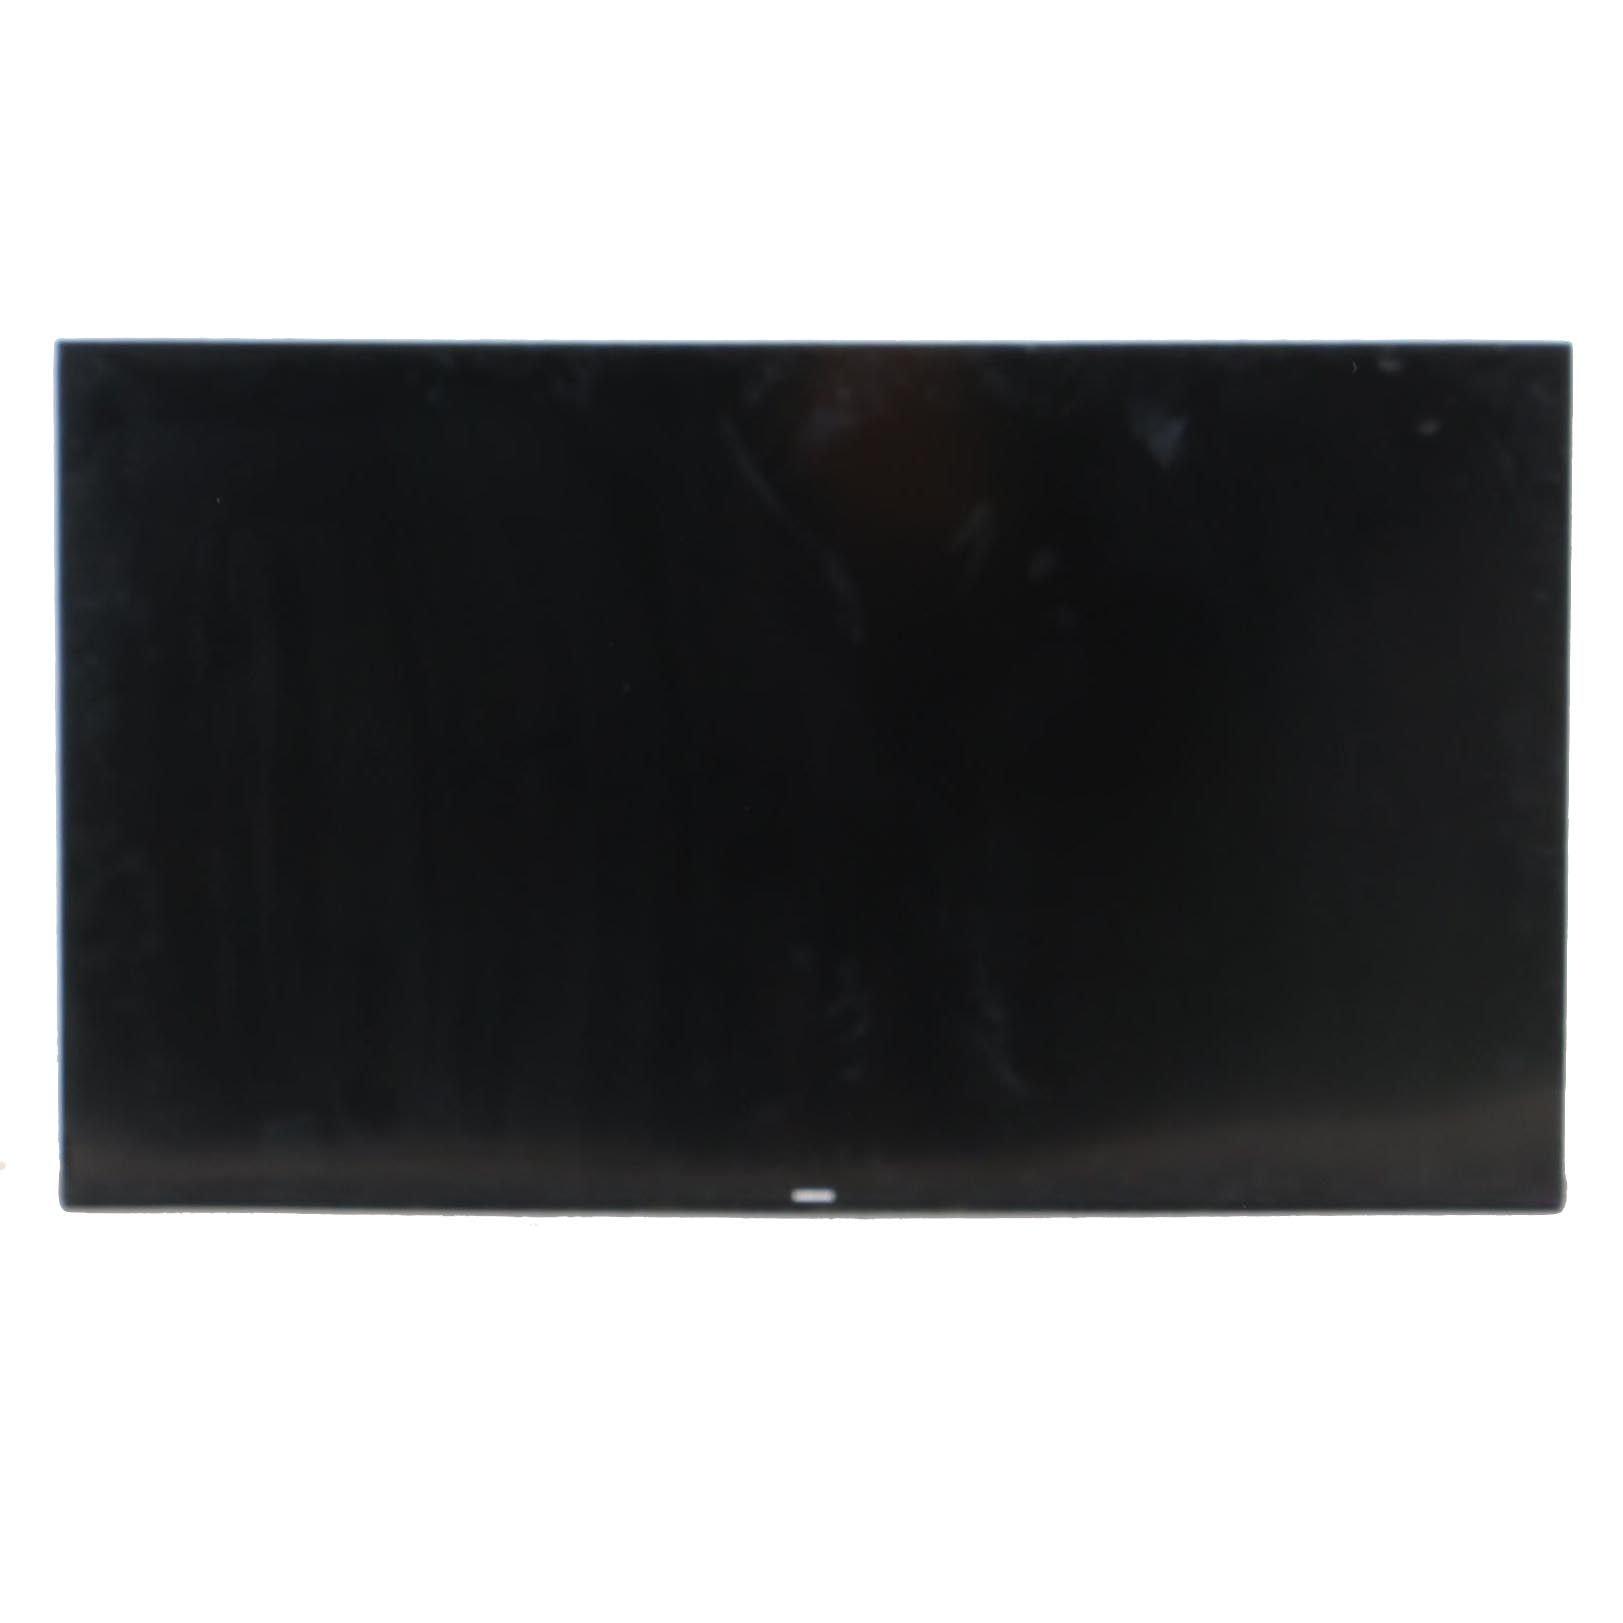 "Samsung 55"" Flat Screen Television"